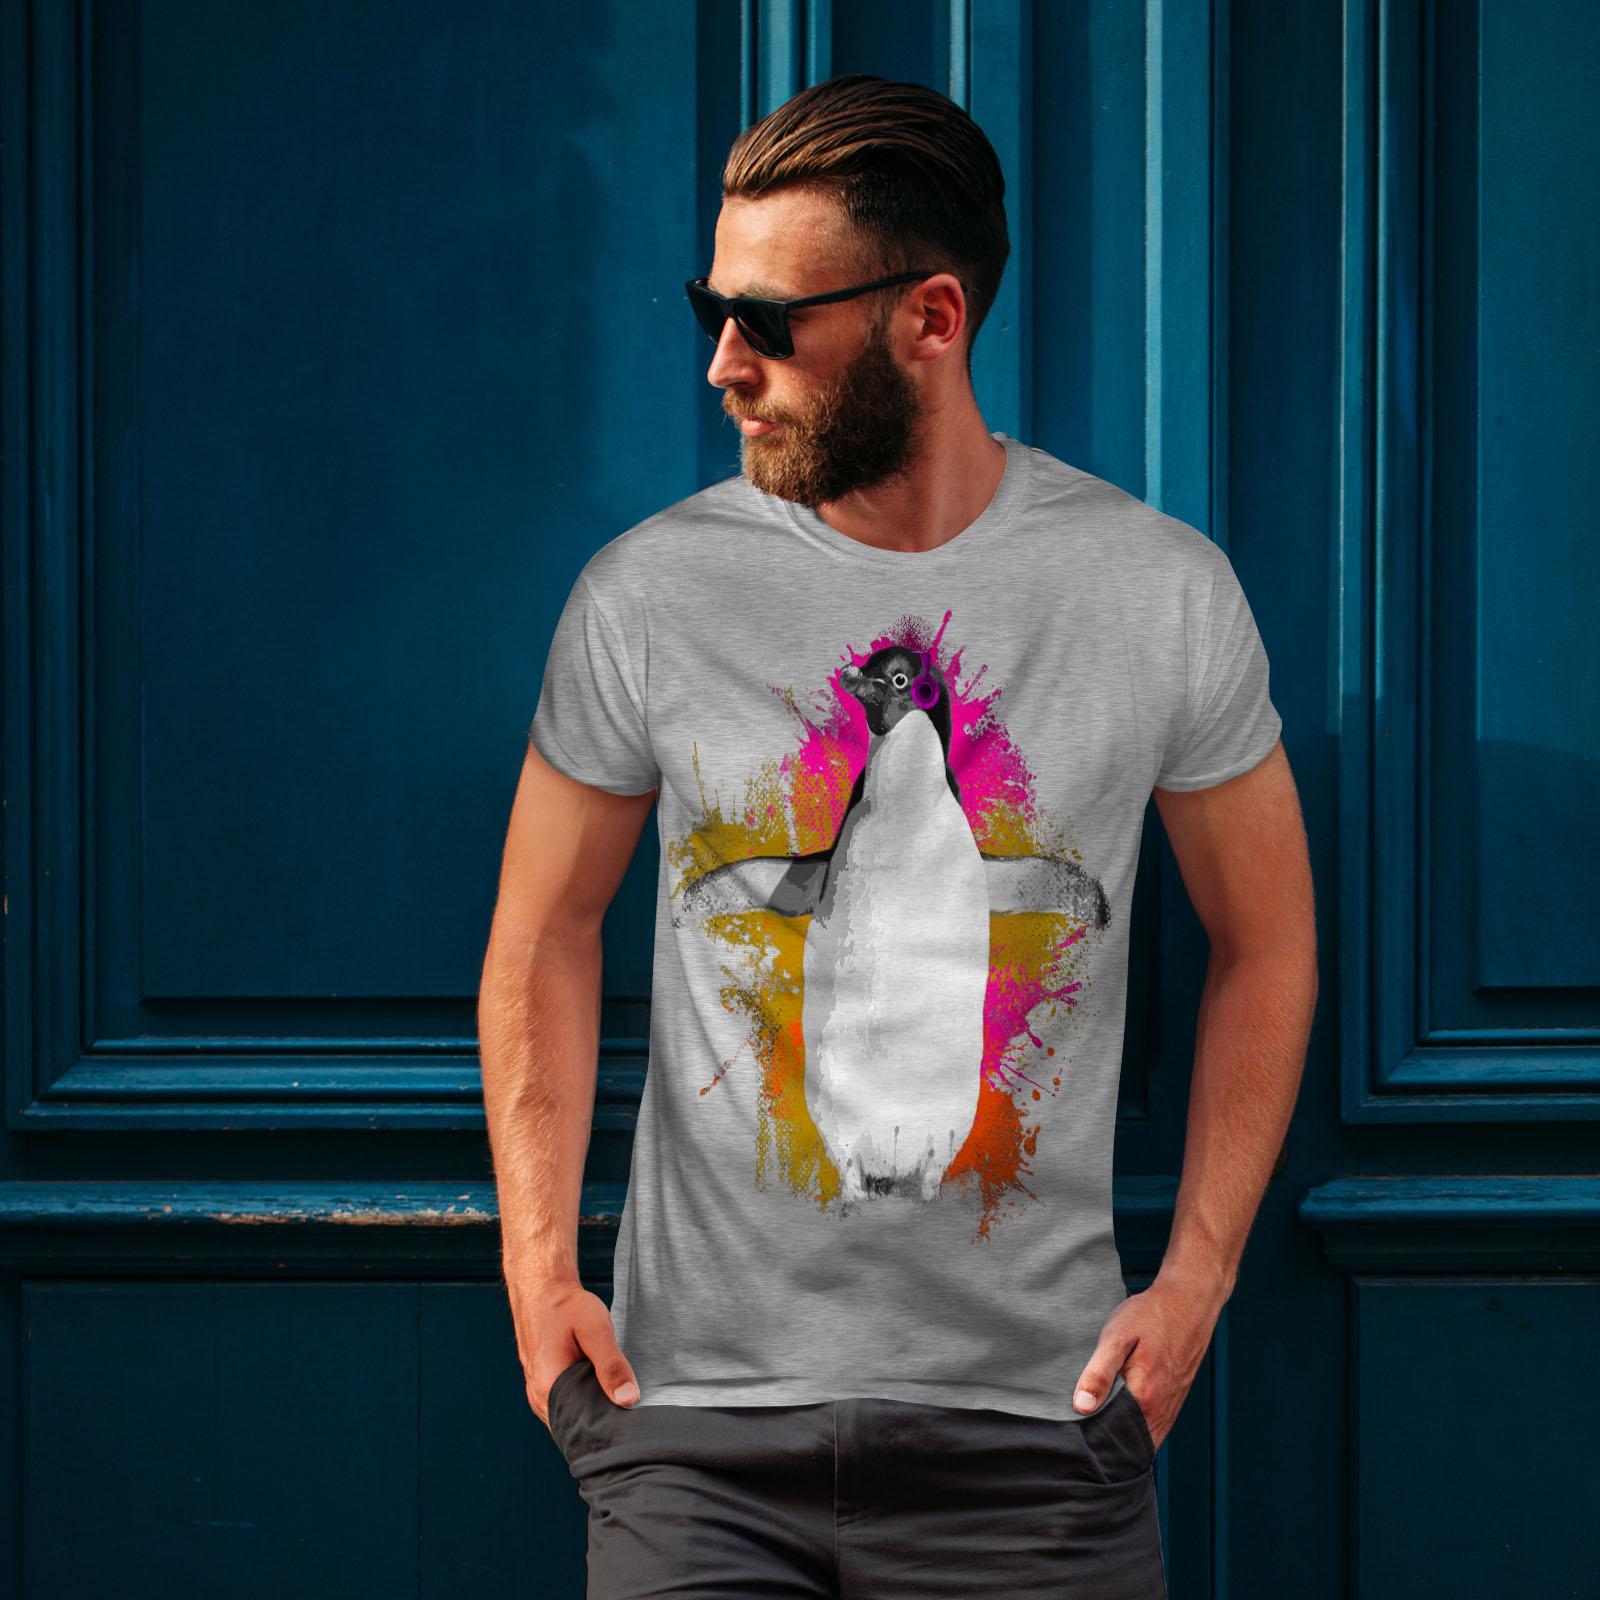 Wellcoda Penguin Music Fan Mens T-shirt Funny Graphic Design Printed Tee